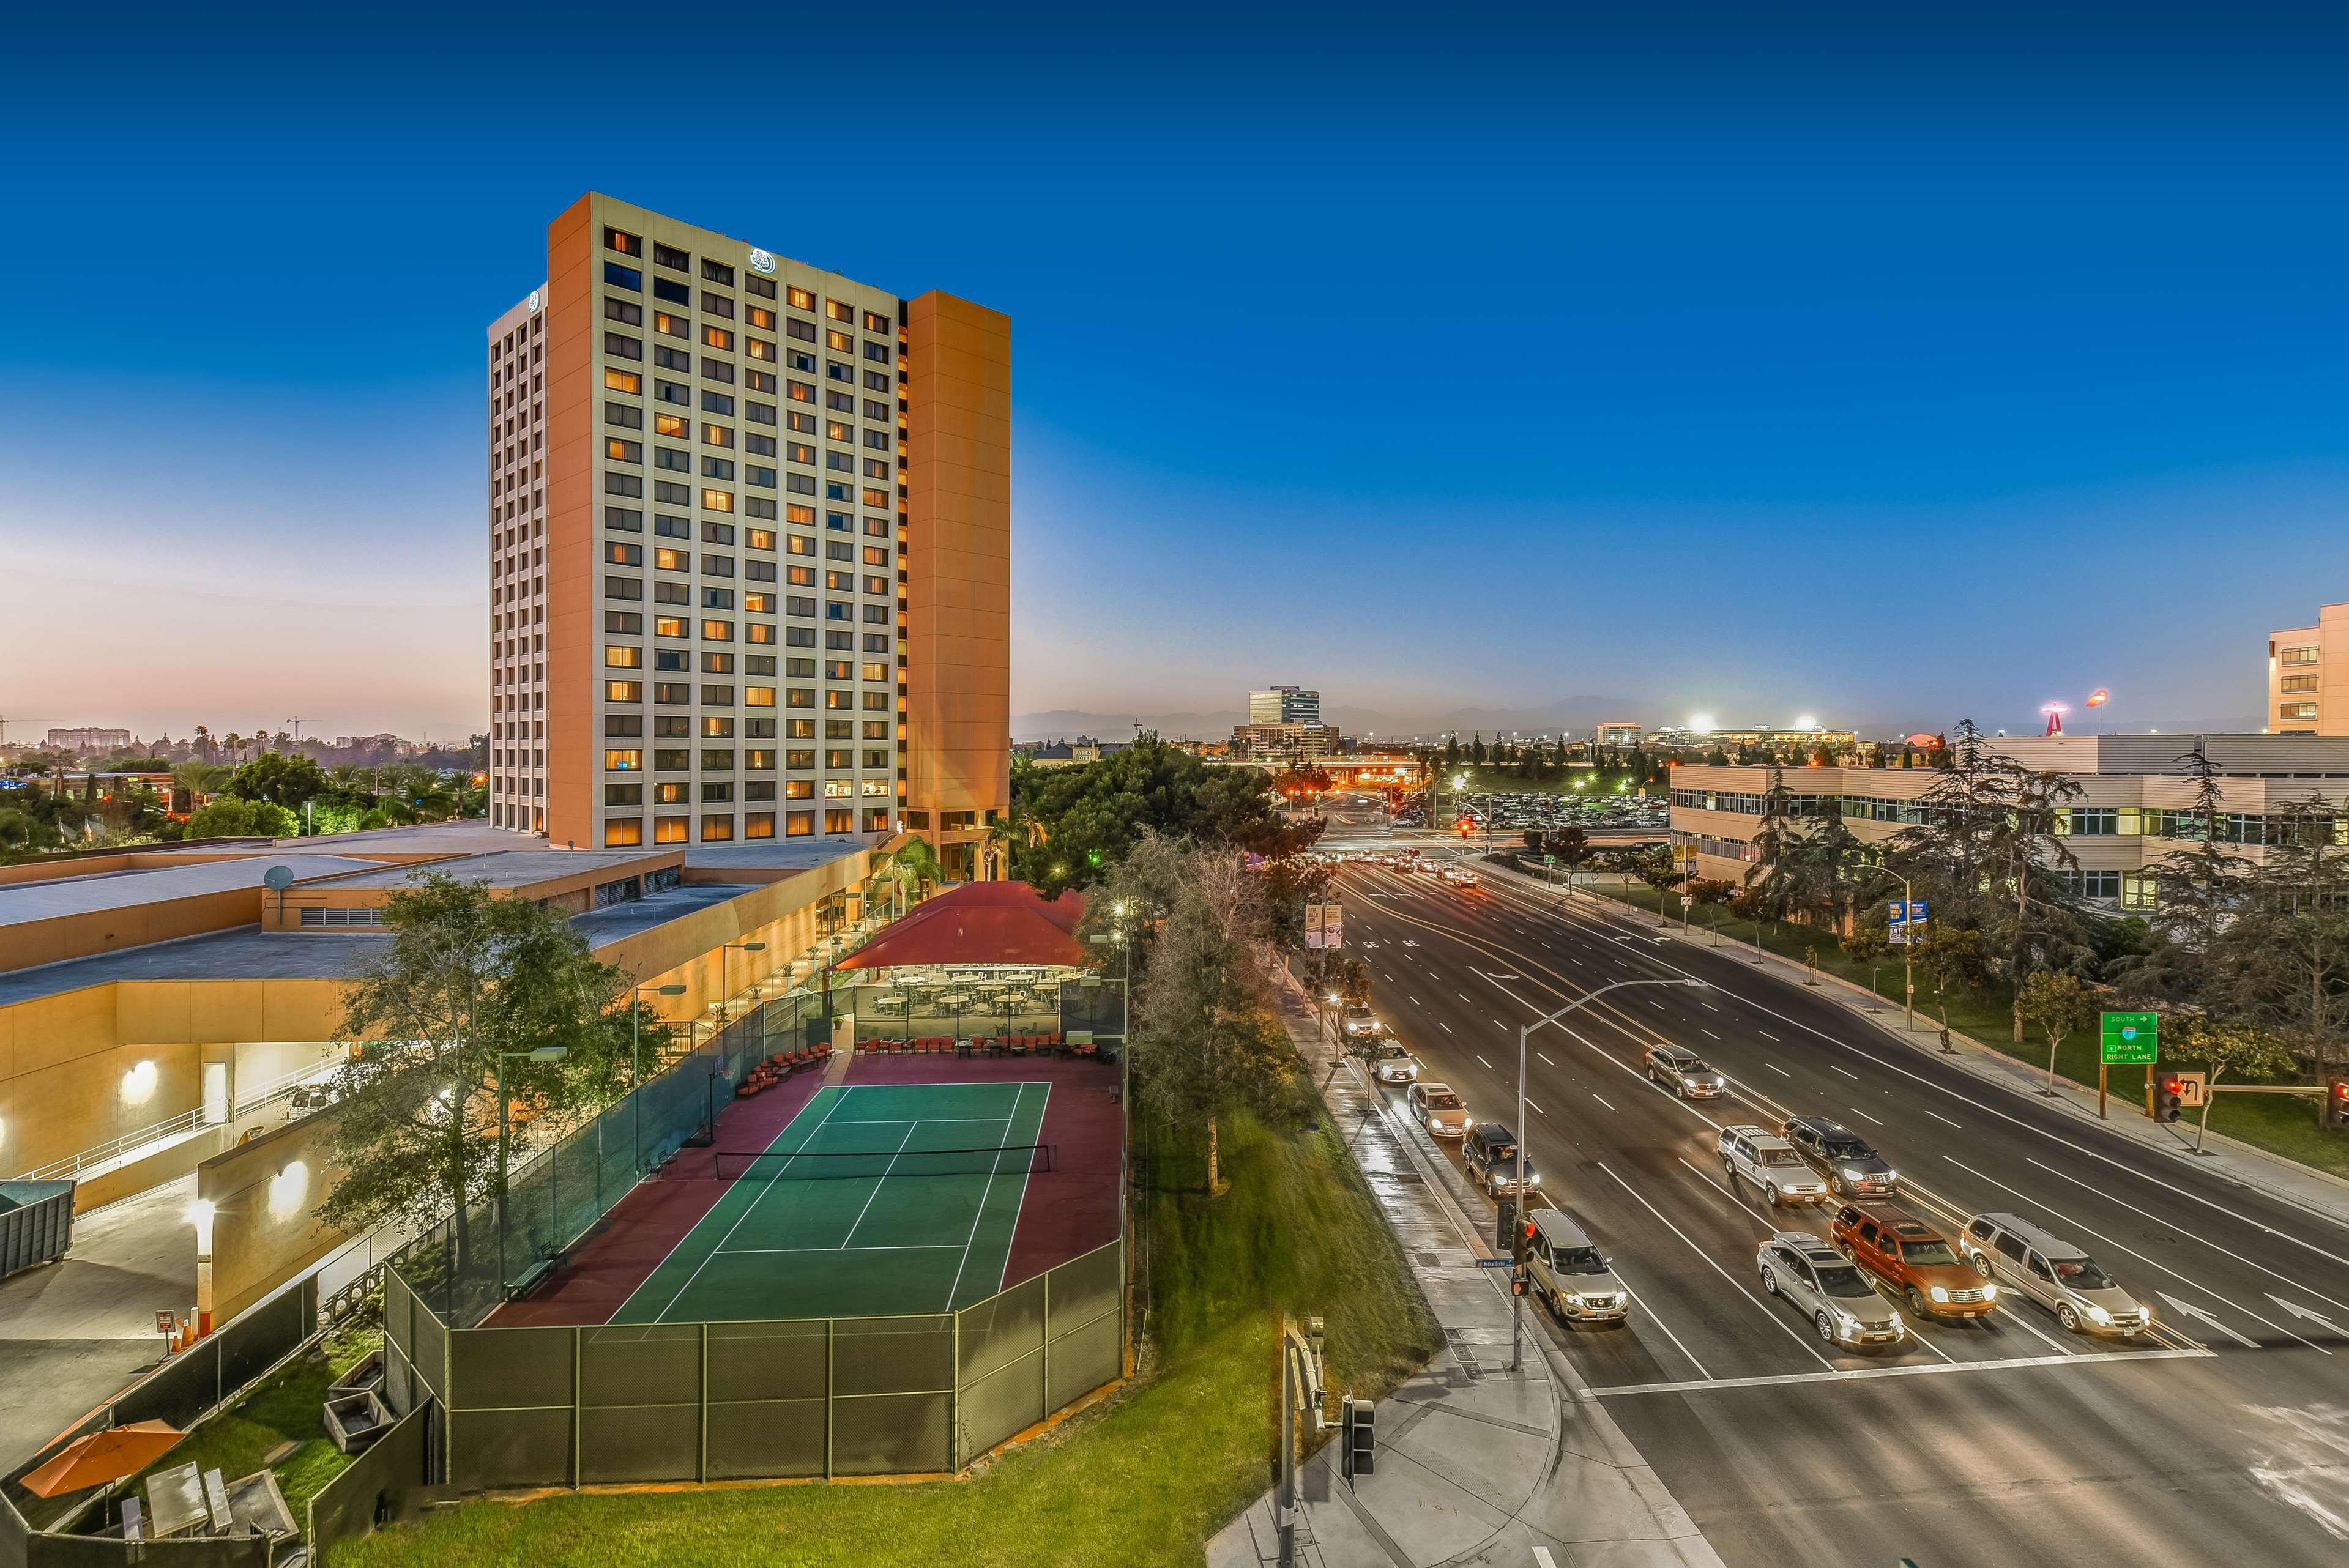 DoubleTree by Hilton Hotel Anaheim - Orange County image 10